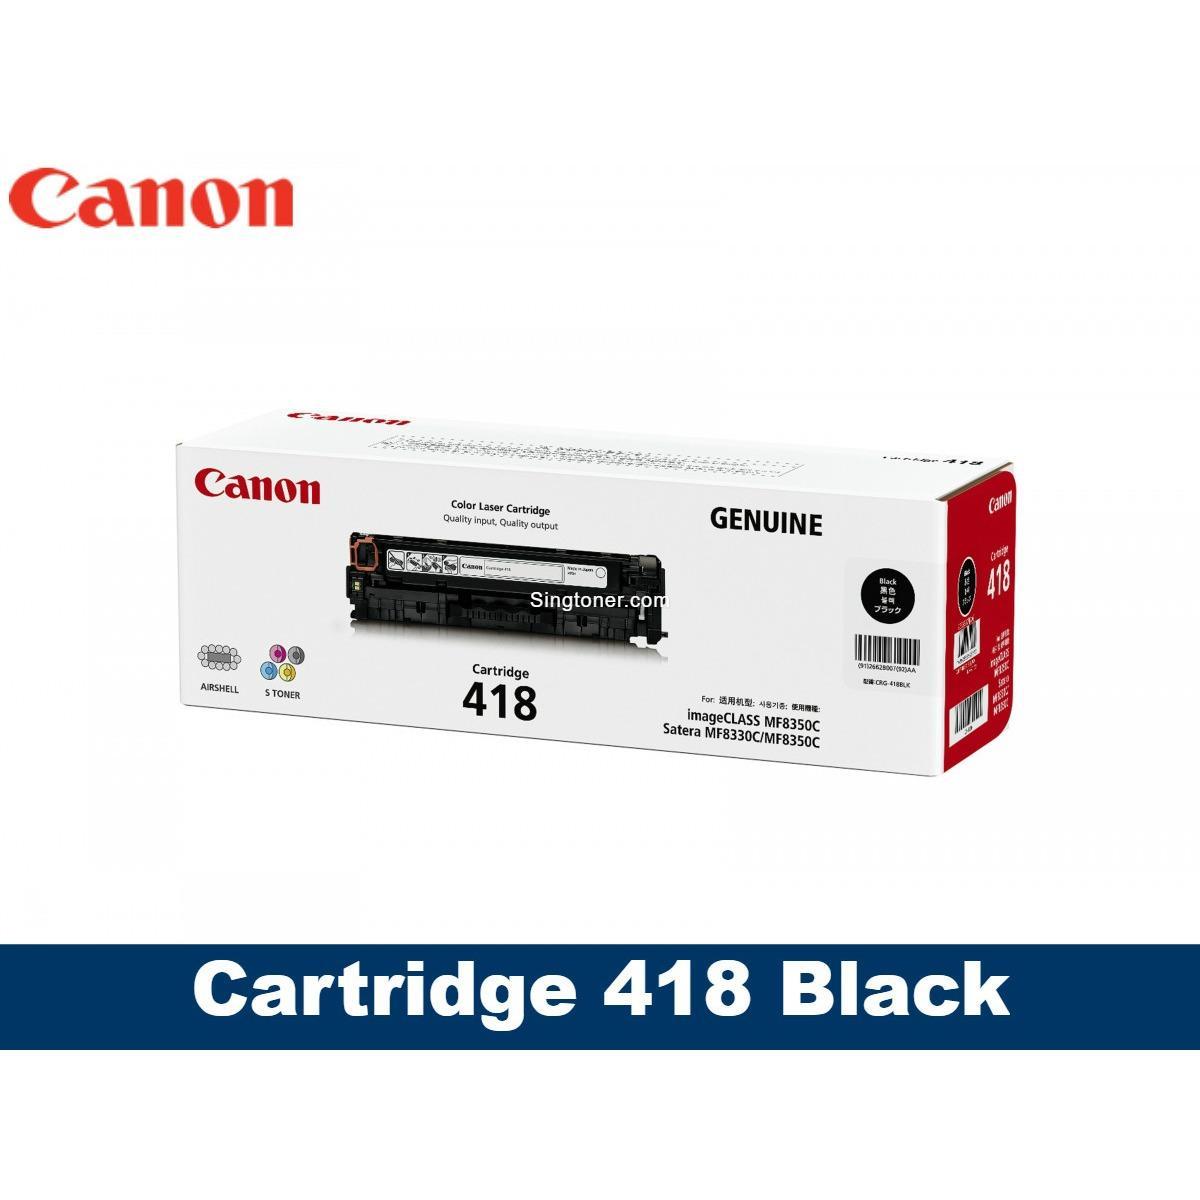 Latest Canon Ink Products Enjoy Huge Discounts Lazada Sg Cartridge Pgi 750xl Black Original 418 Toner For Imageclass Mf8350cdn Mf8380cdw